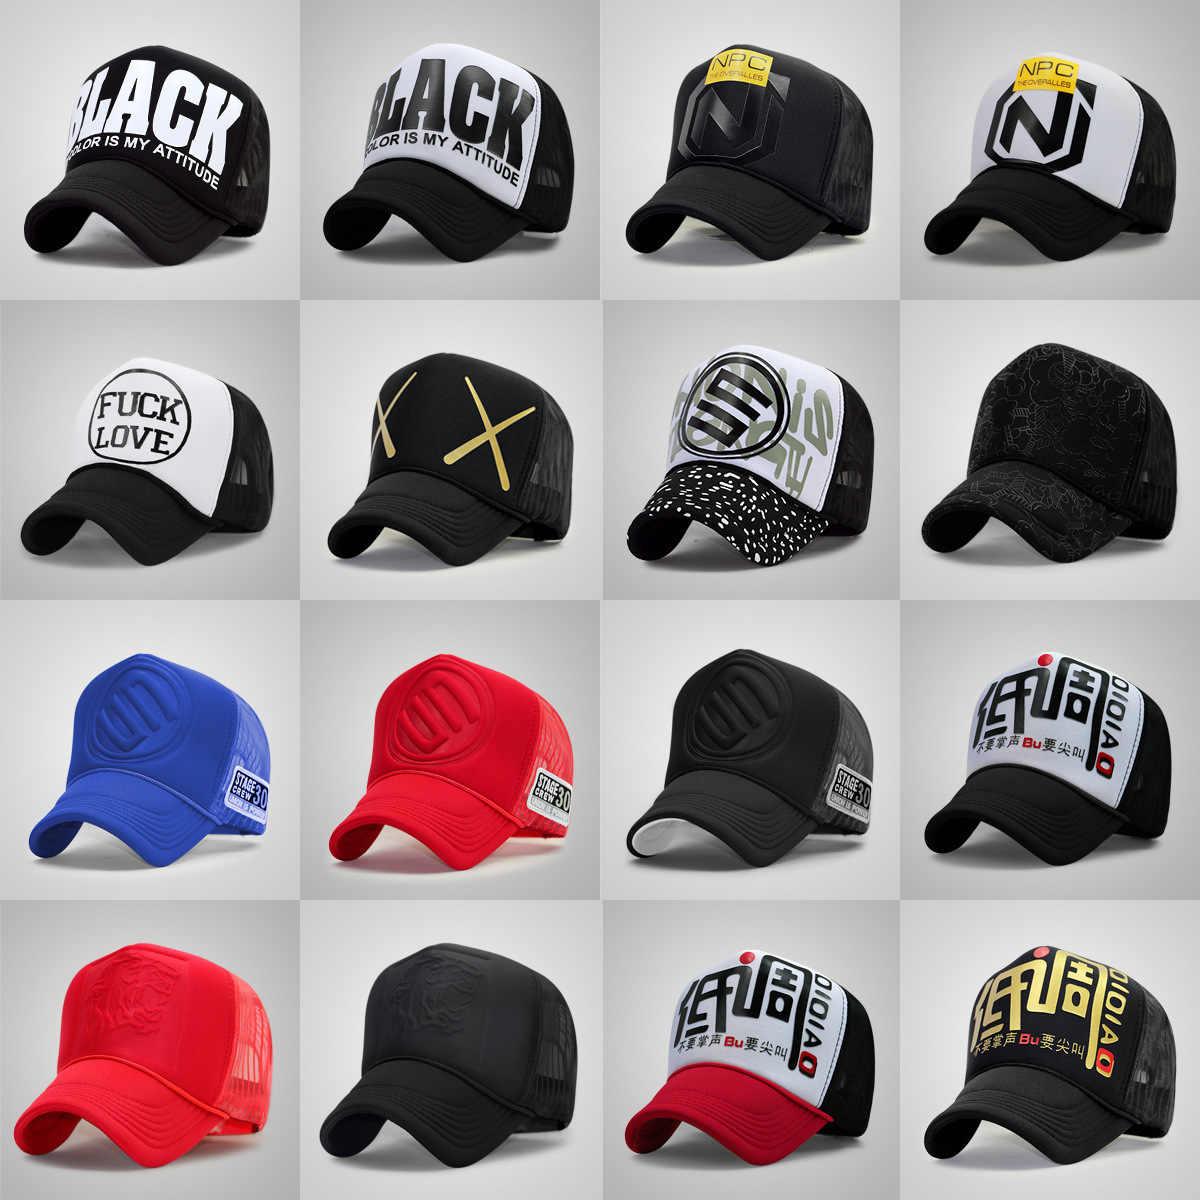 4eaf79c72153f Wholesale Adult Trucker Cap Men And Women Hiphop Punk Rock Snapback Hats  Male Summer Sunshade Mesh